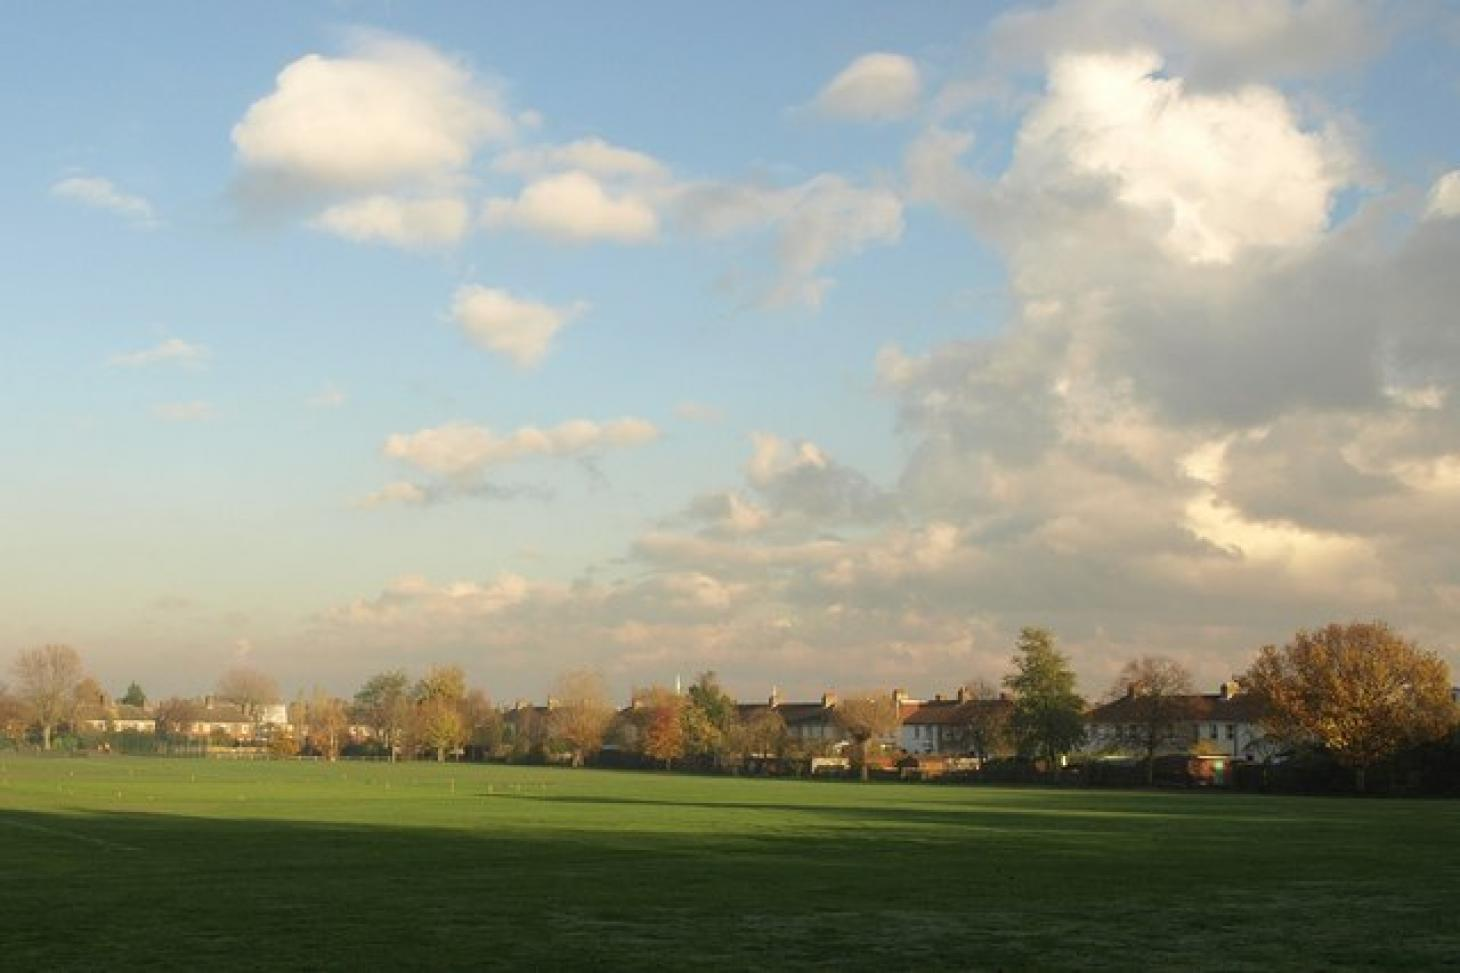 Joseph Hood Recreation Ground Full size | Grass cricket facilities